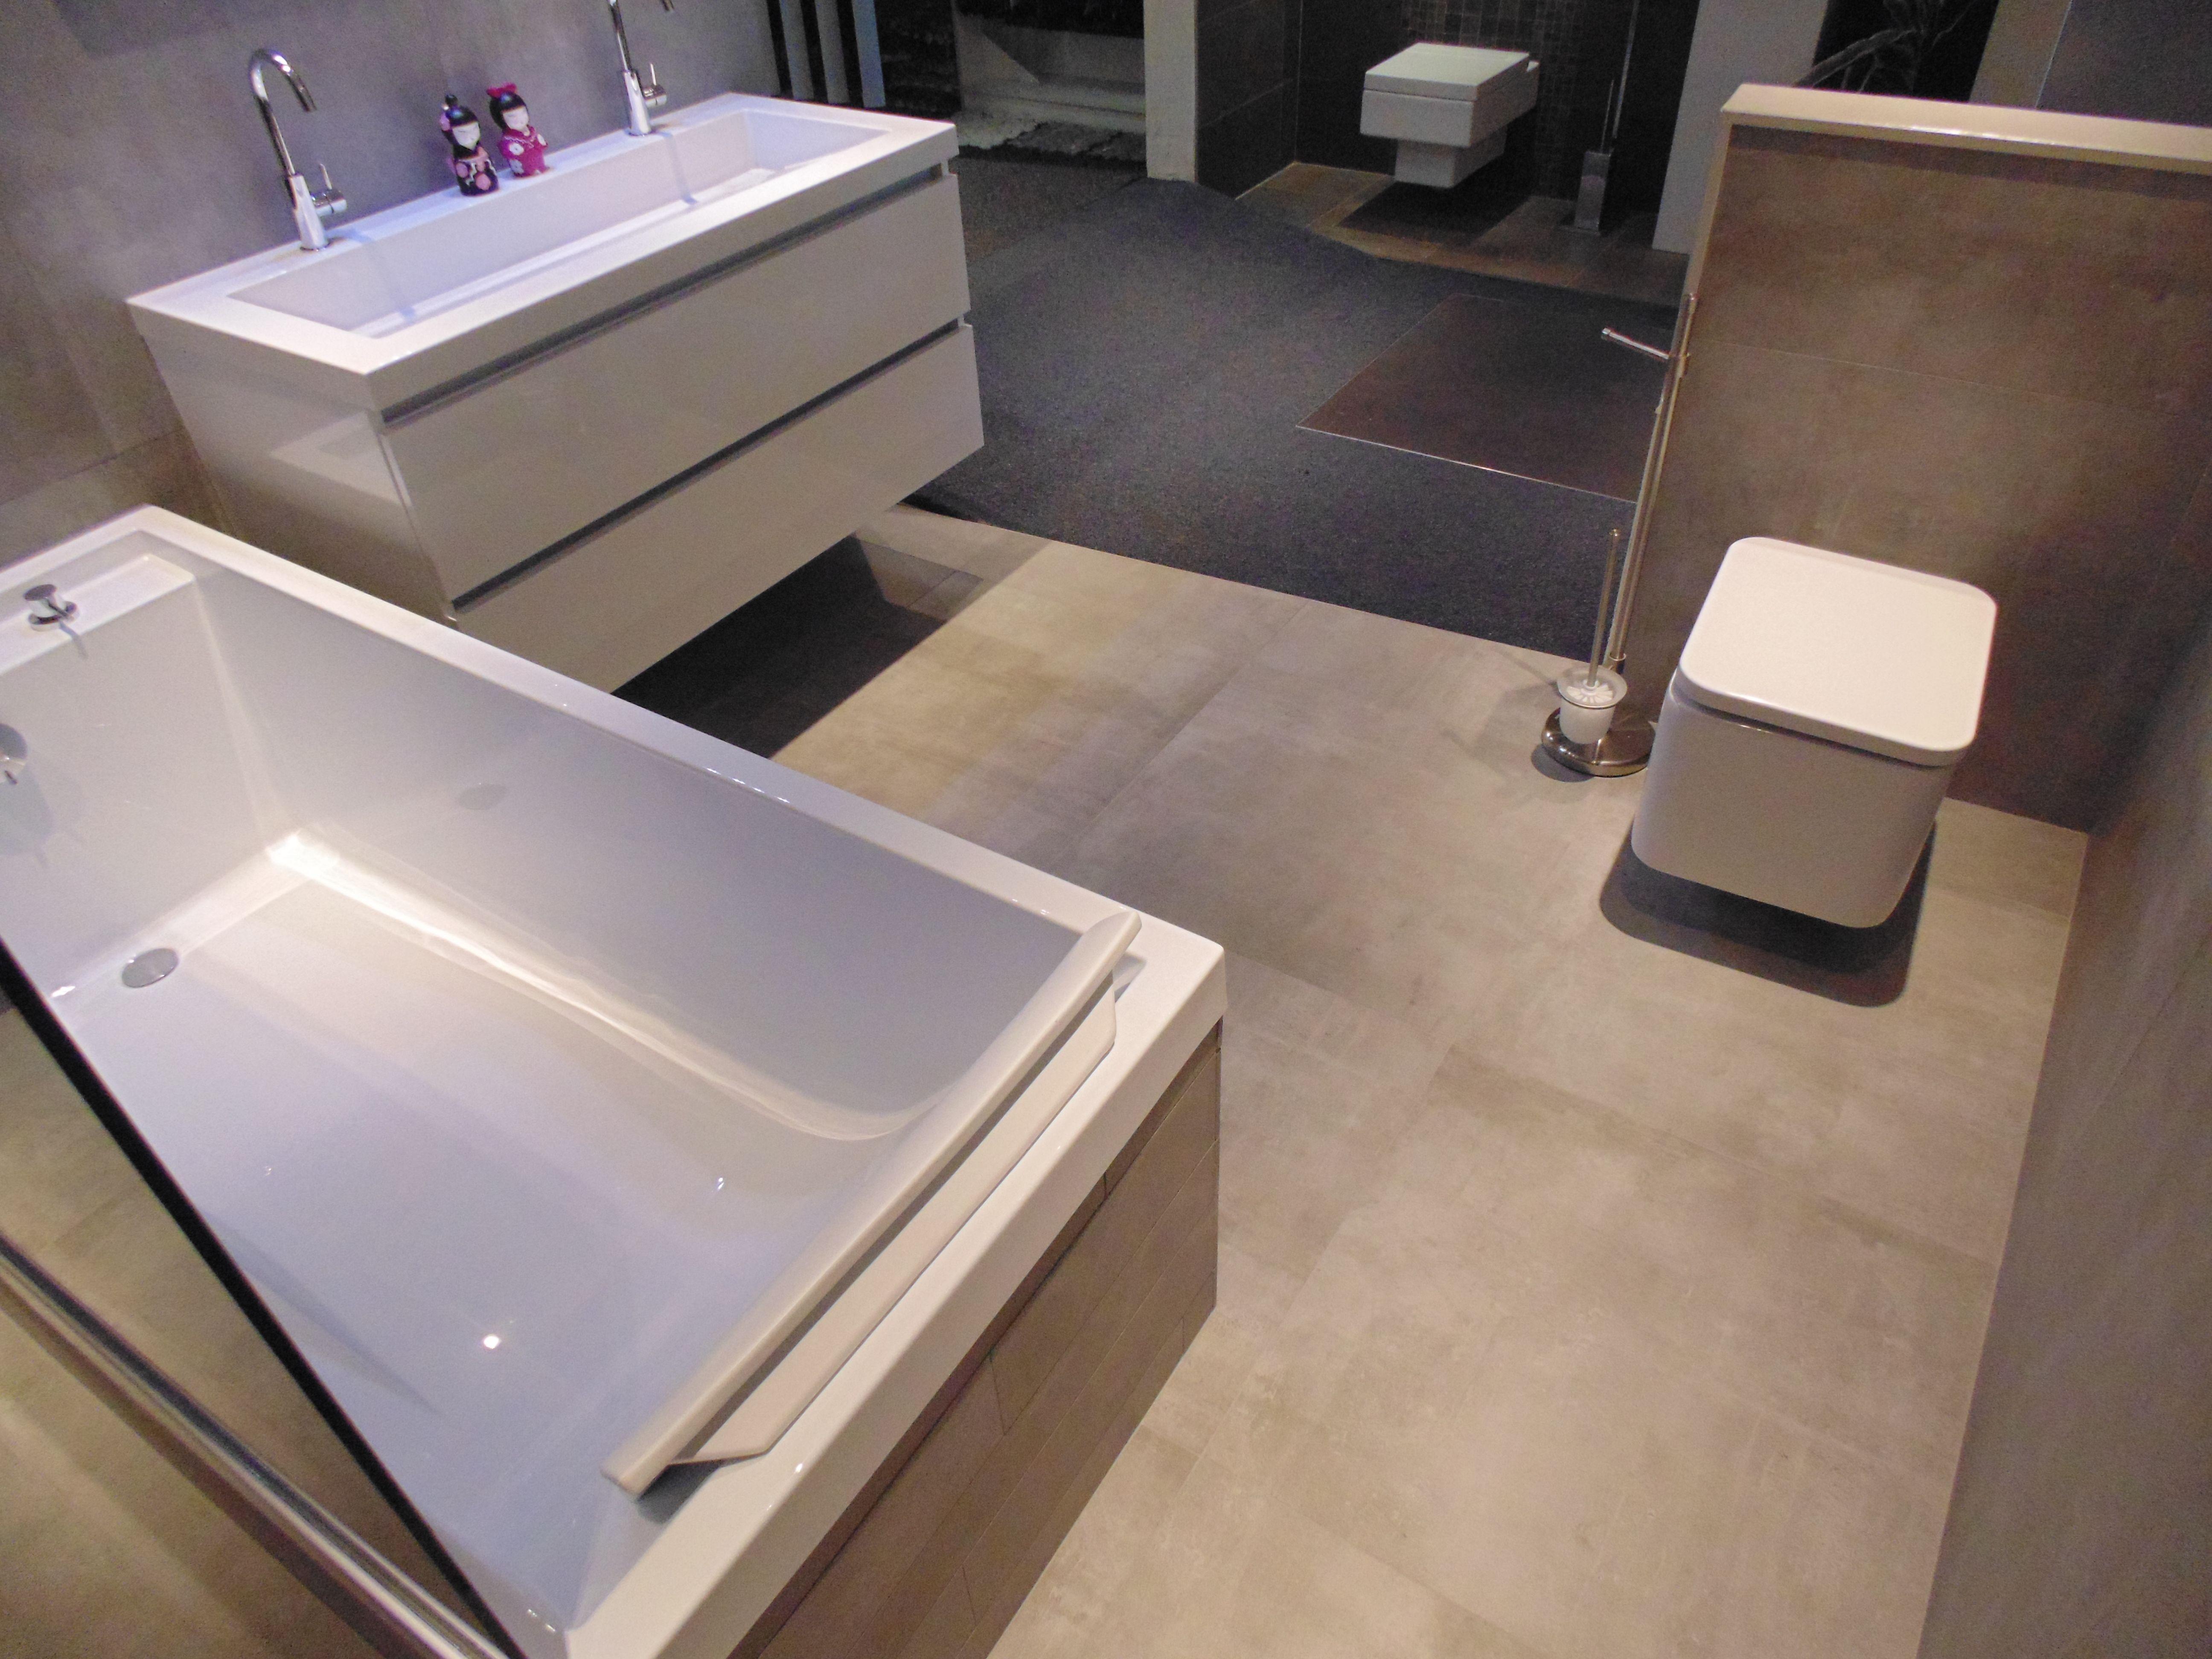 badkamer opstelling met betonlook tegels betonlook tegels